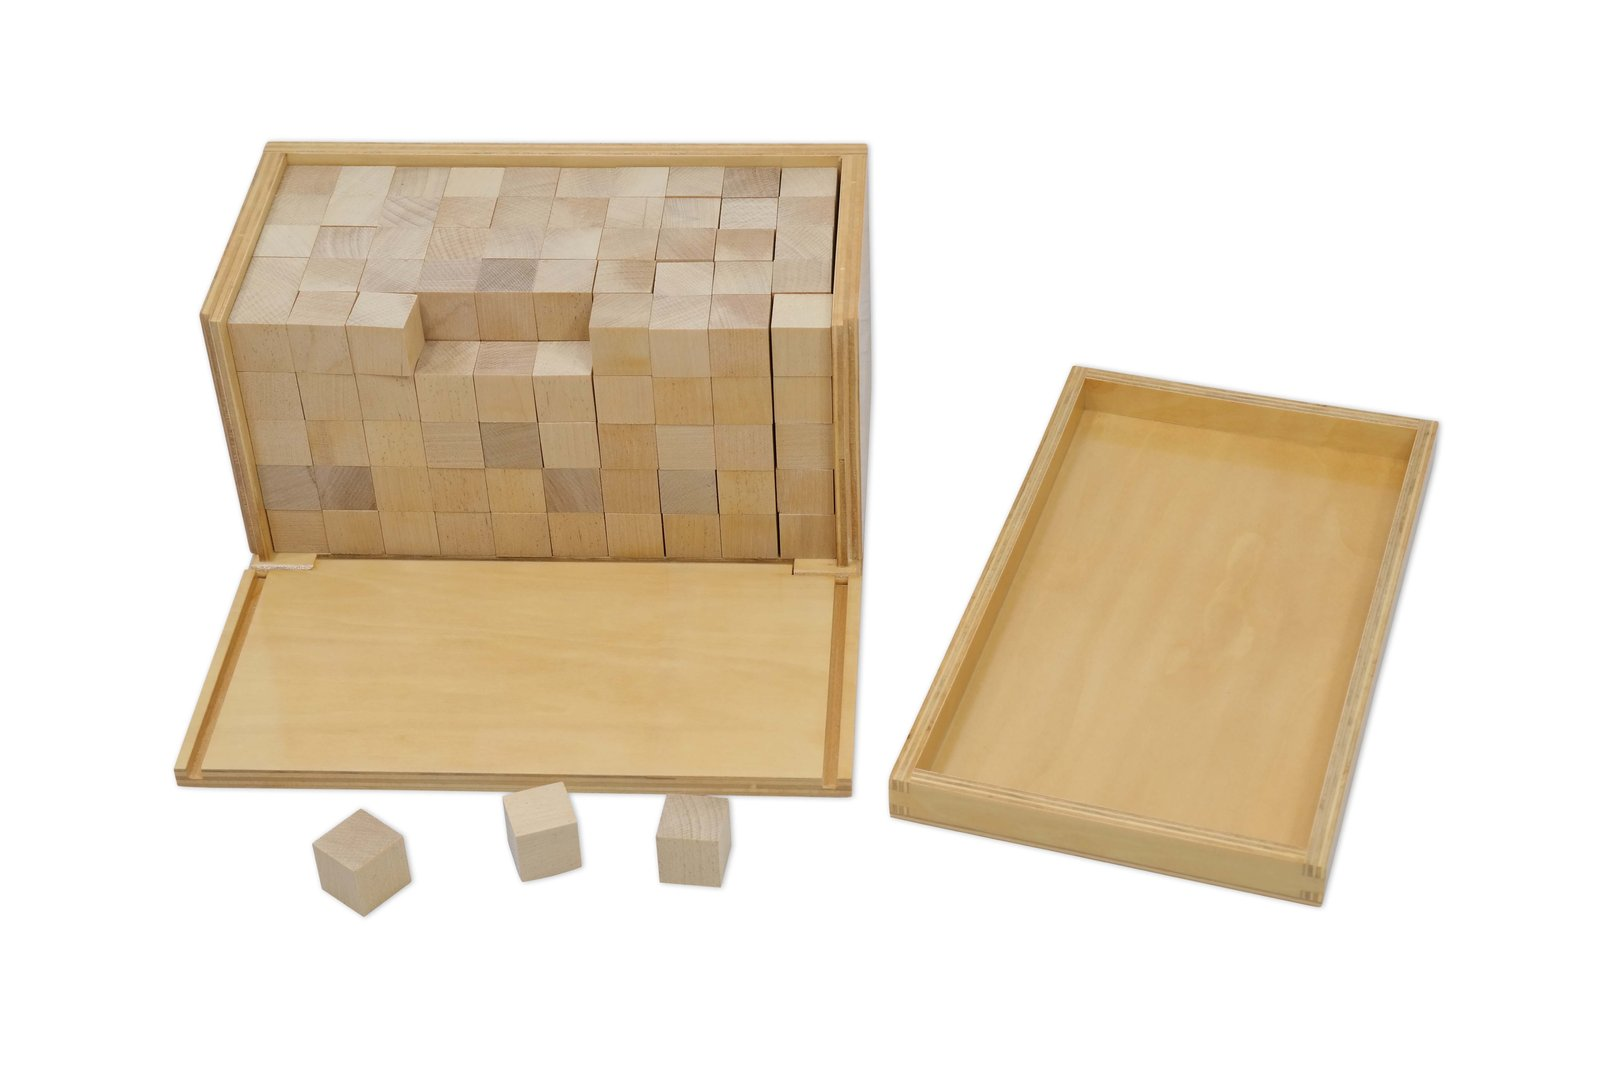 Volume Box With 250 Cubes 2x2x2 Cm